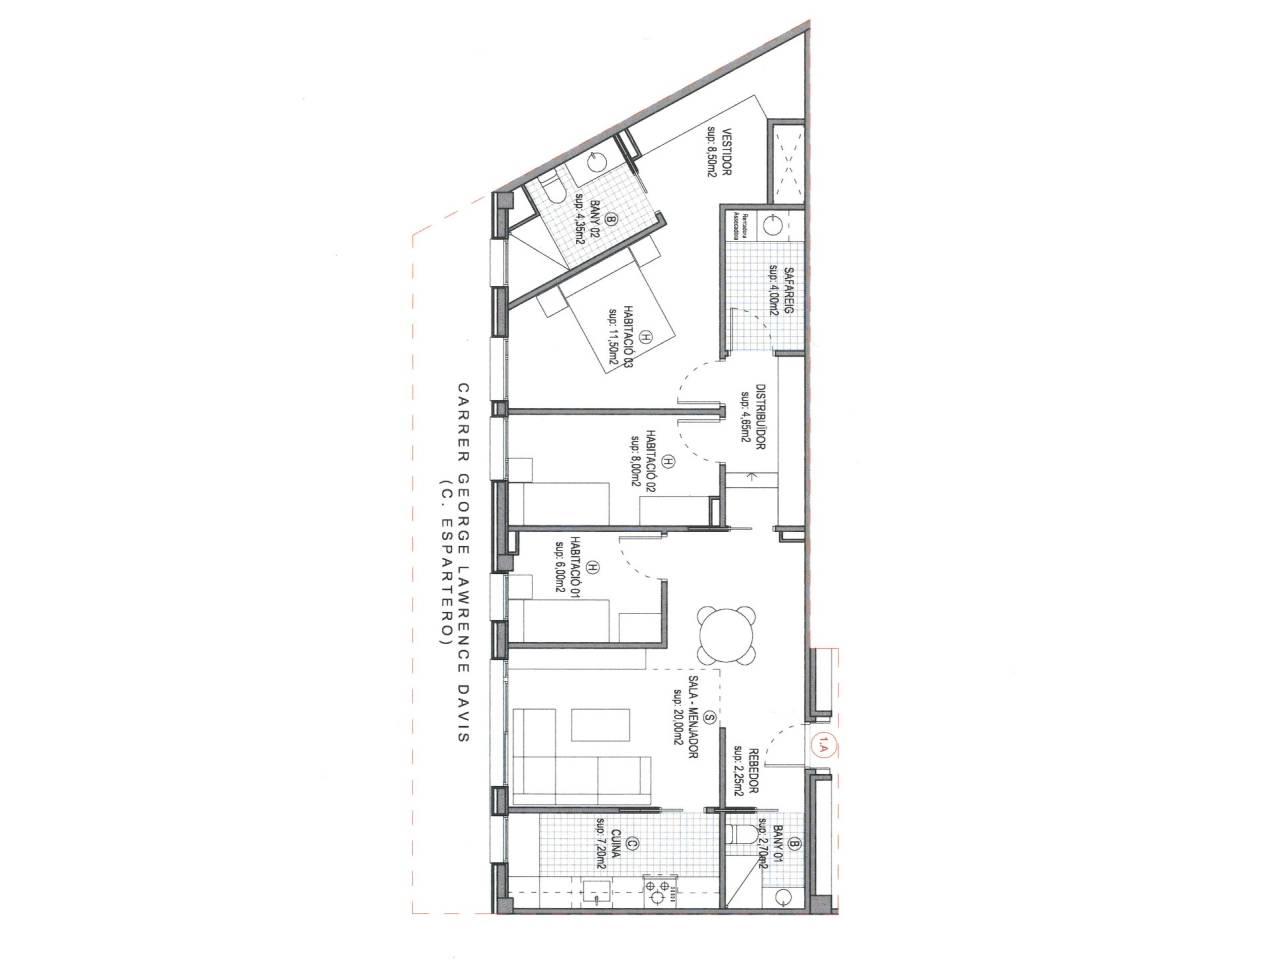 Lloguer Pis  Calle buenos aires. Superficie total 90 m², piso superficie útil 79 m², hab. individ